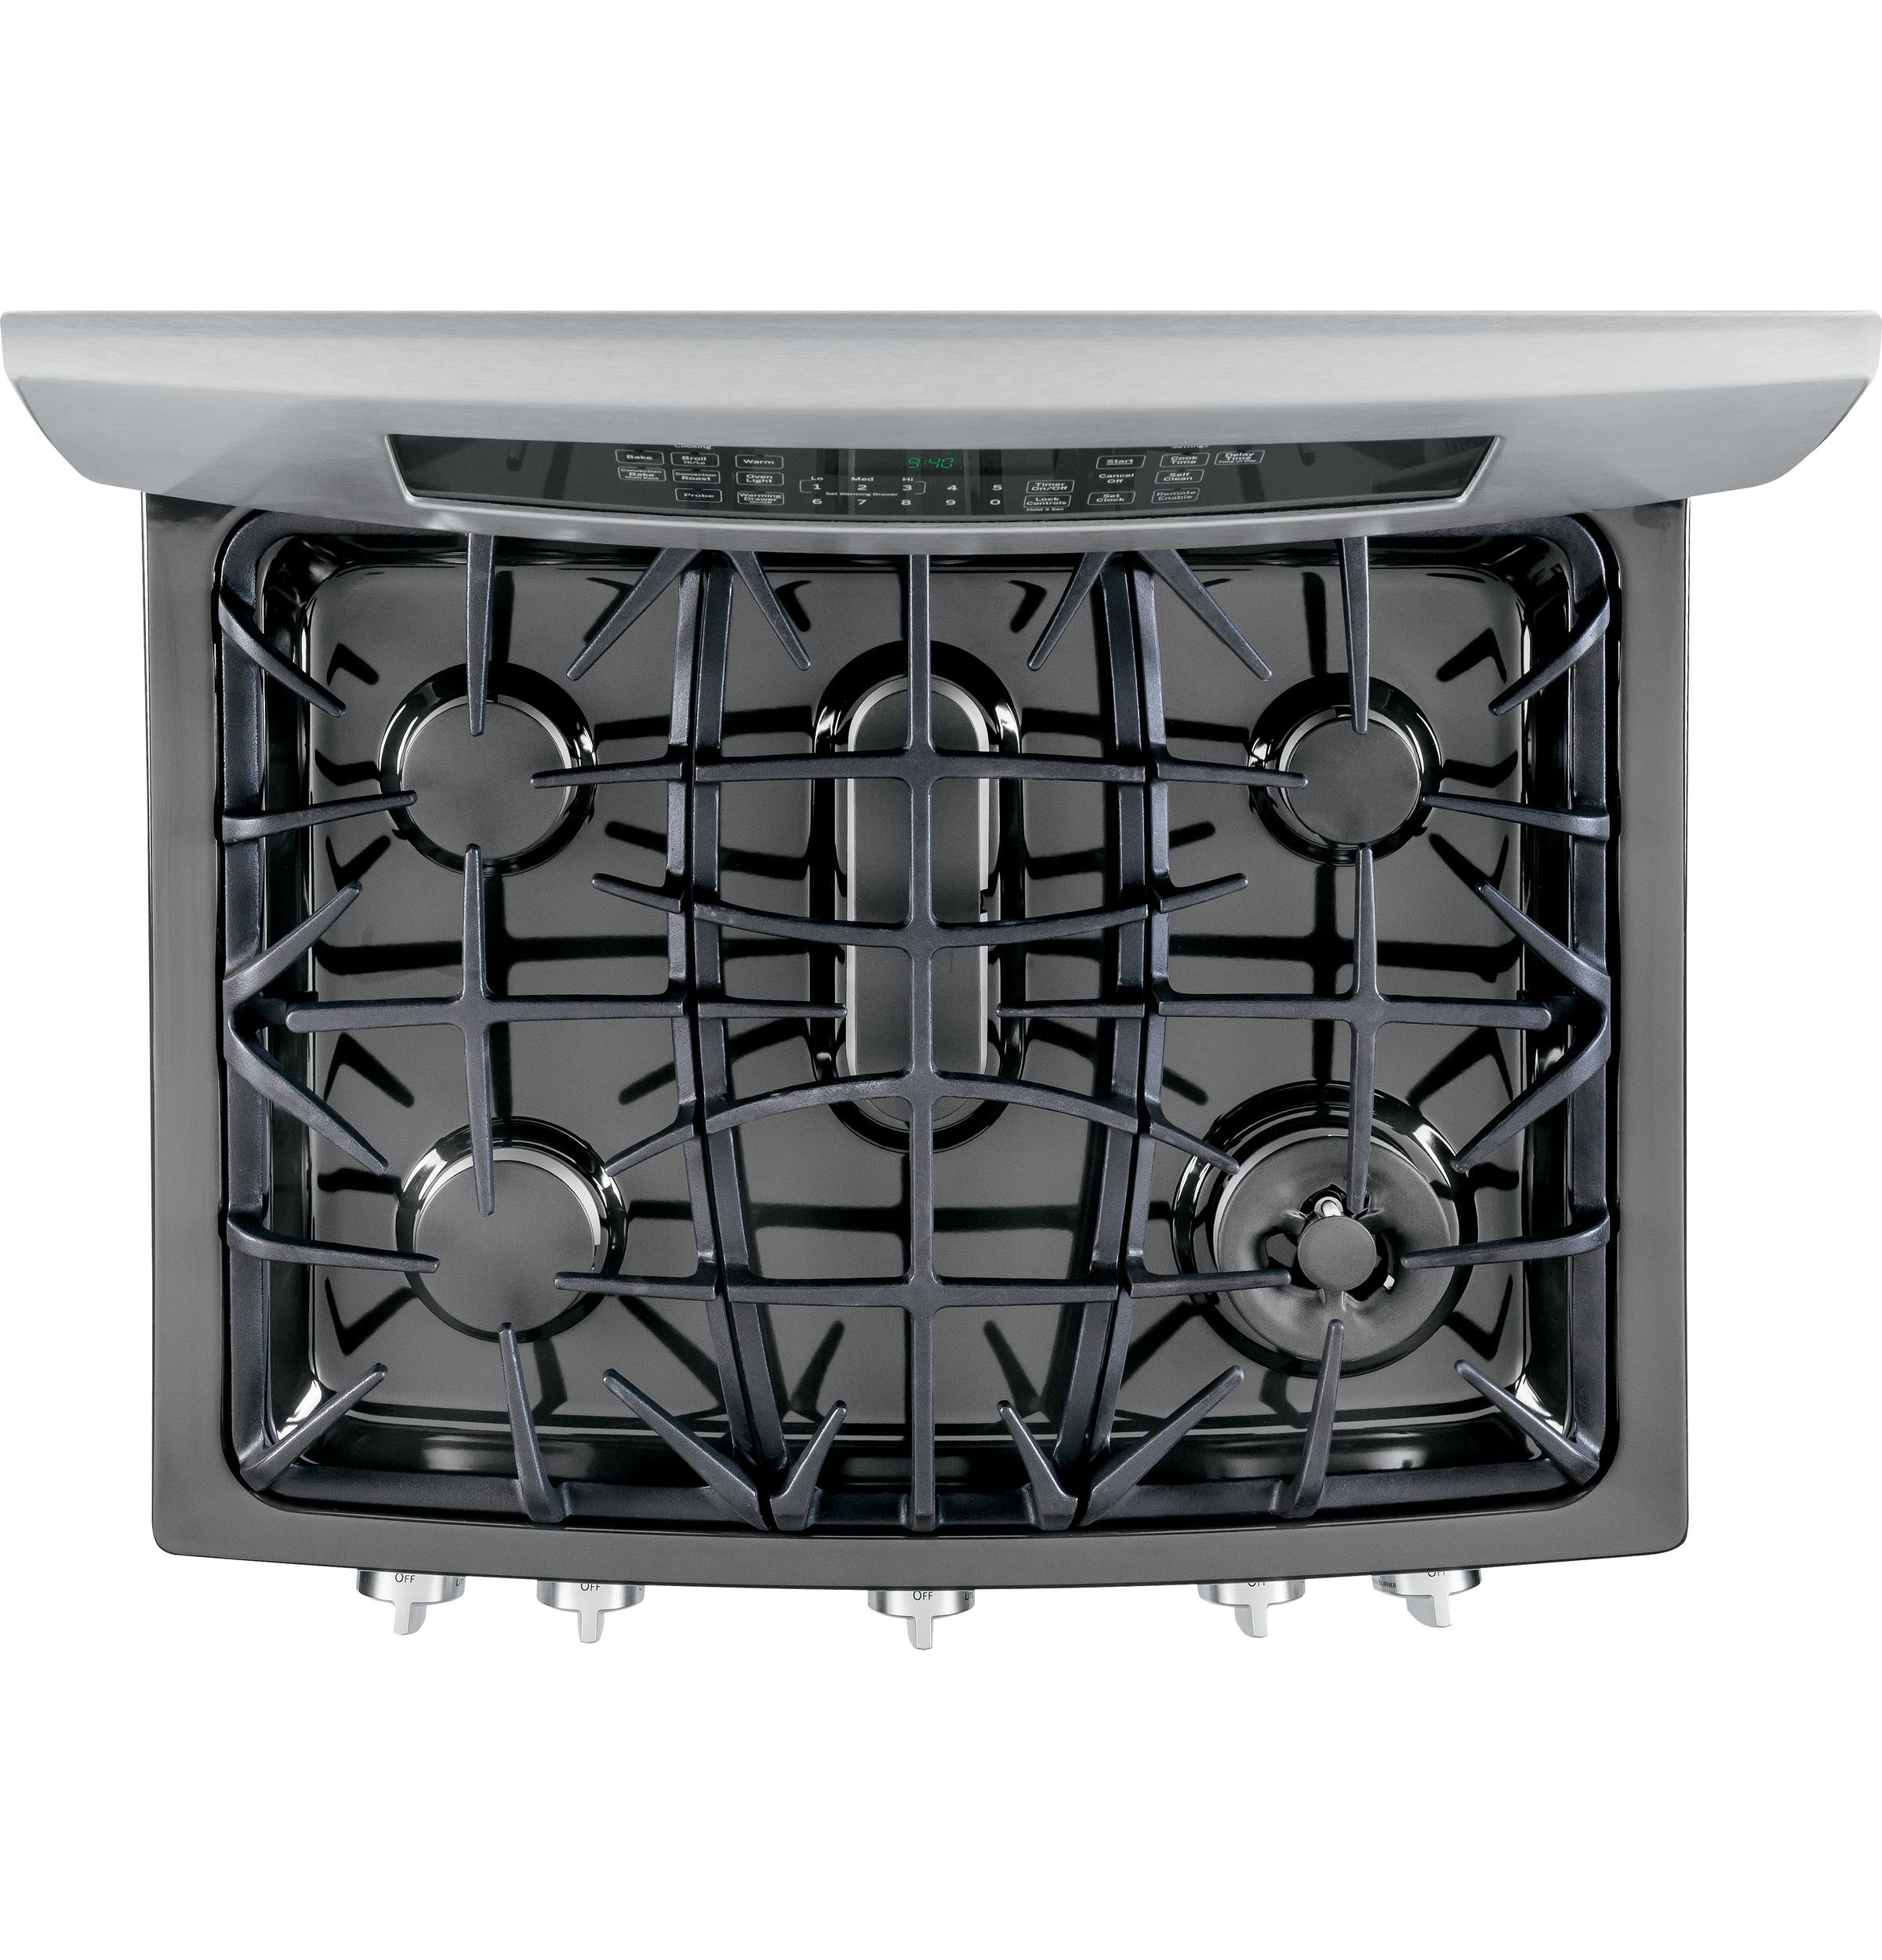 GE Profile 5.6 cu. ft. Dual-Fuel Freestanding Range w/ Warming Drawer - Stainless Steel